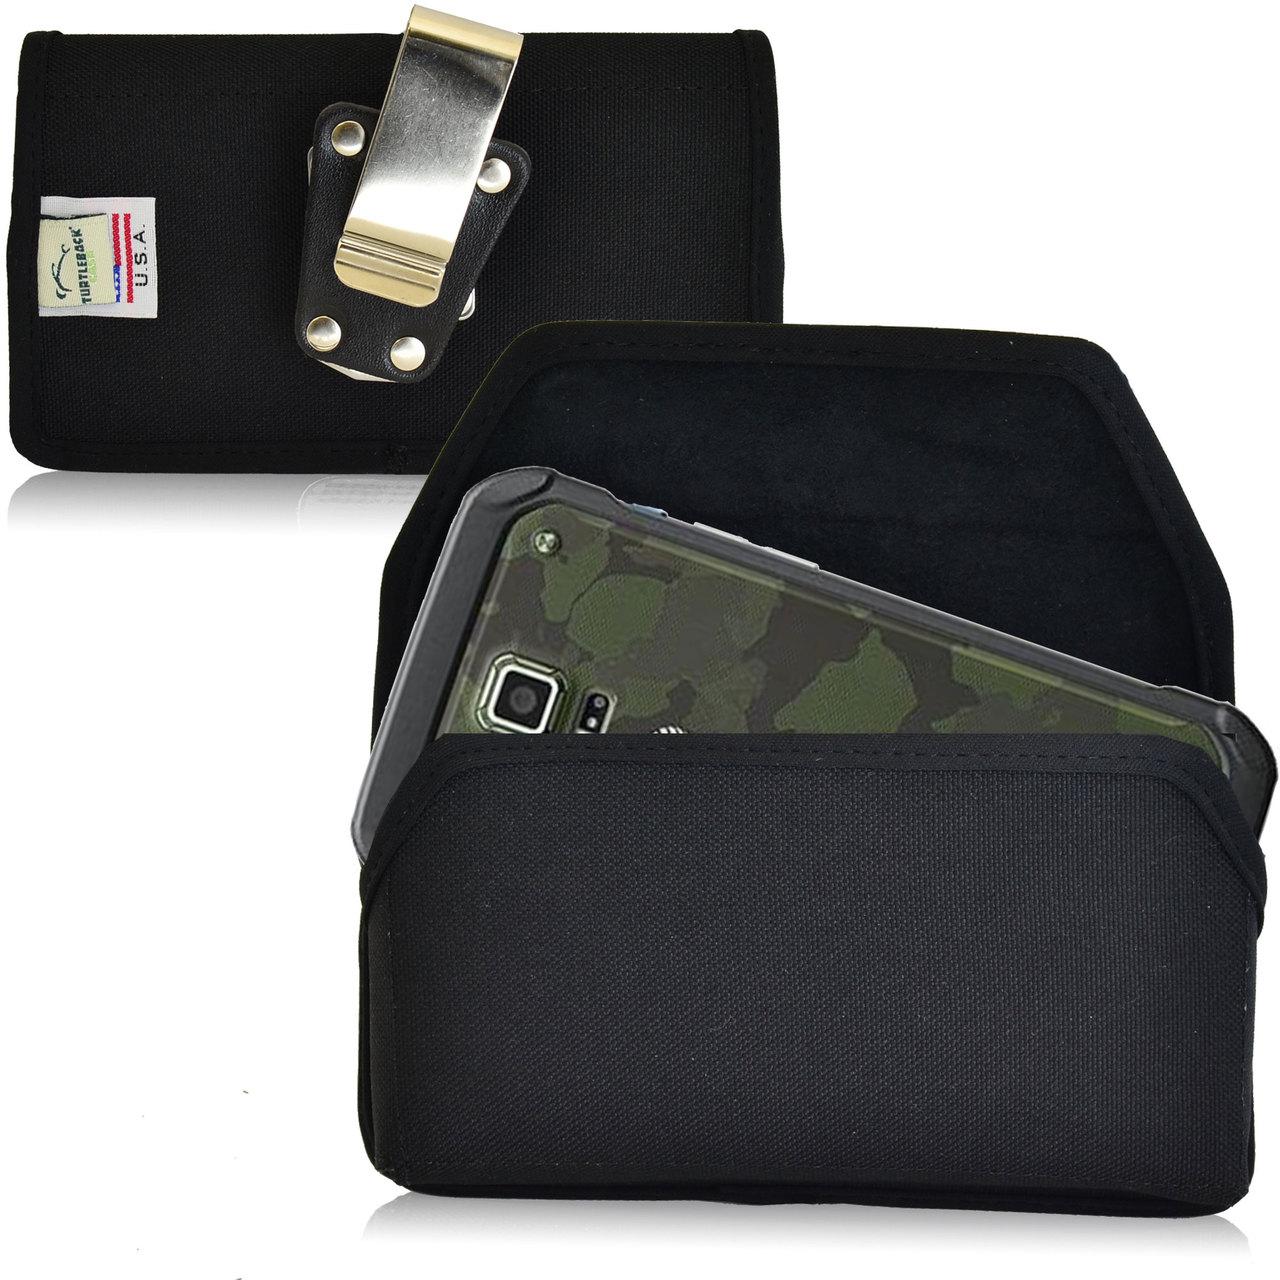 promo code 37c69 d51e6 Samsung Galaxy S5 Active Horizontal Nylon Holster, Metal Belt Clip